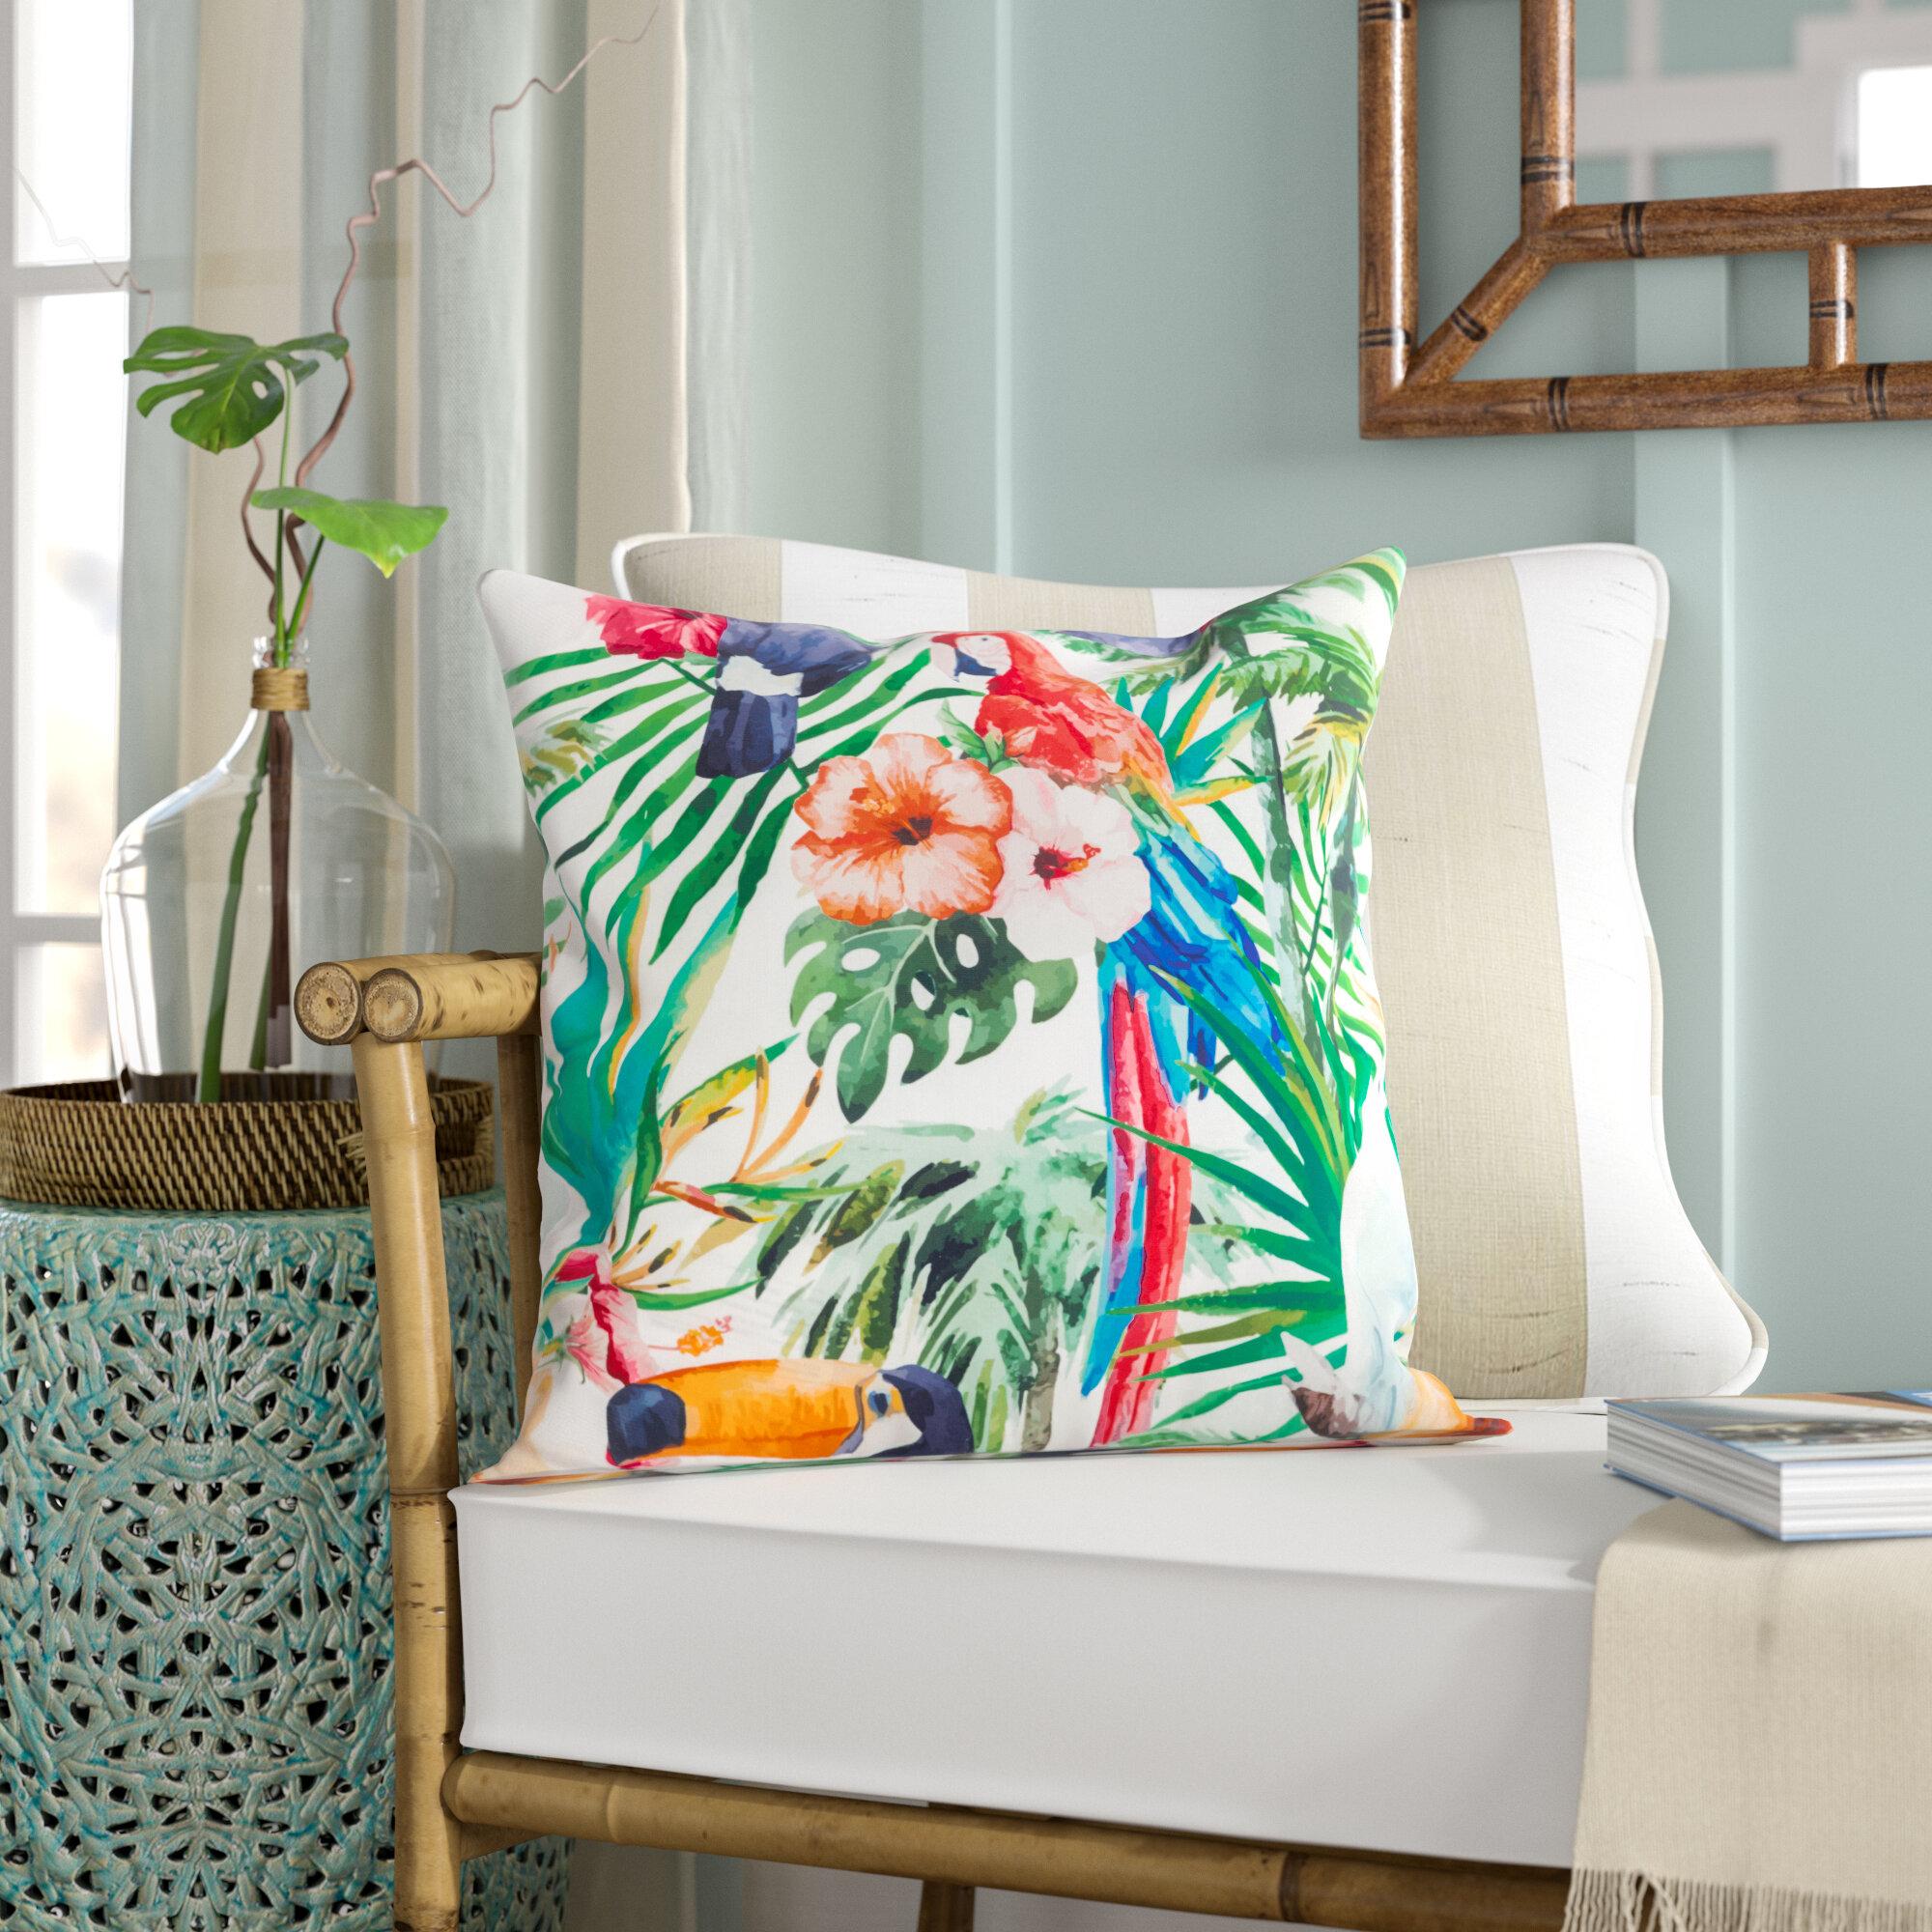 Sherwick Tropical Parrot Floral Print Indoor Outdoor Throw Pillow